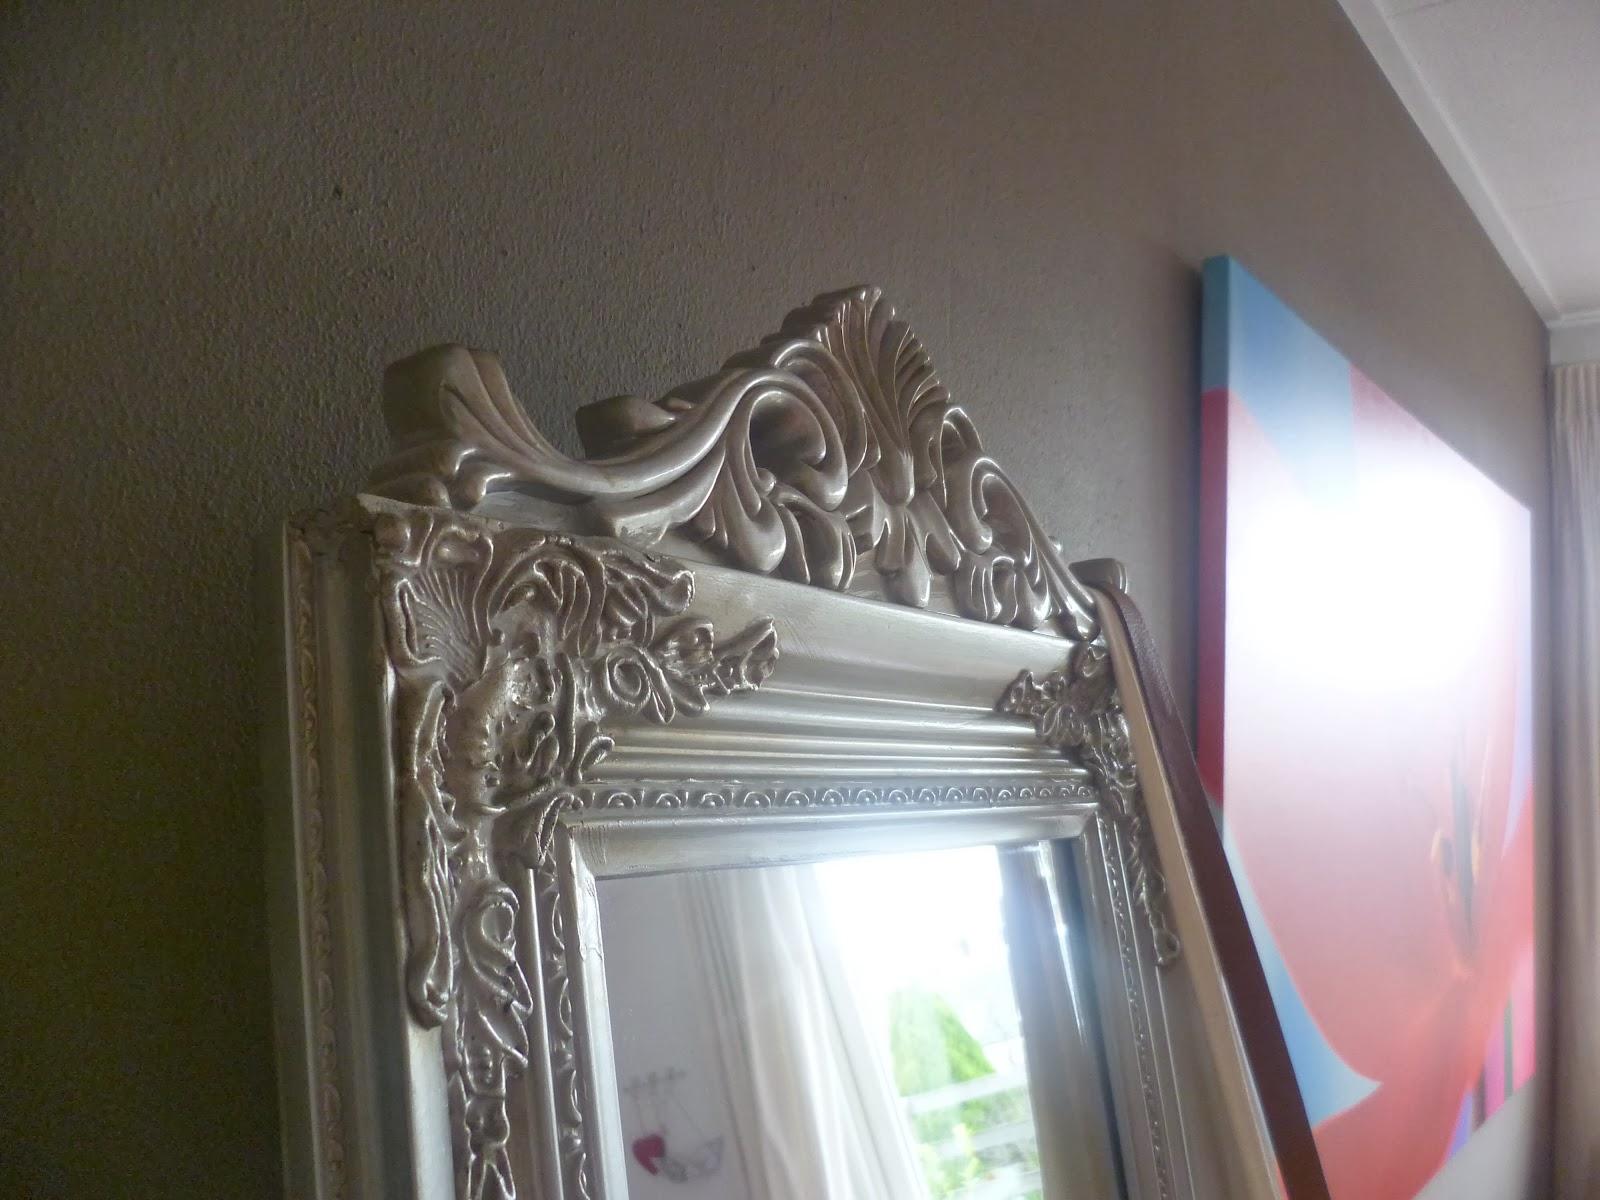 Barok nachtkastjes xenos - Barok spiegel voor badkamers ...